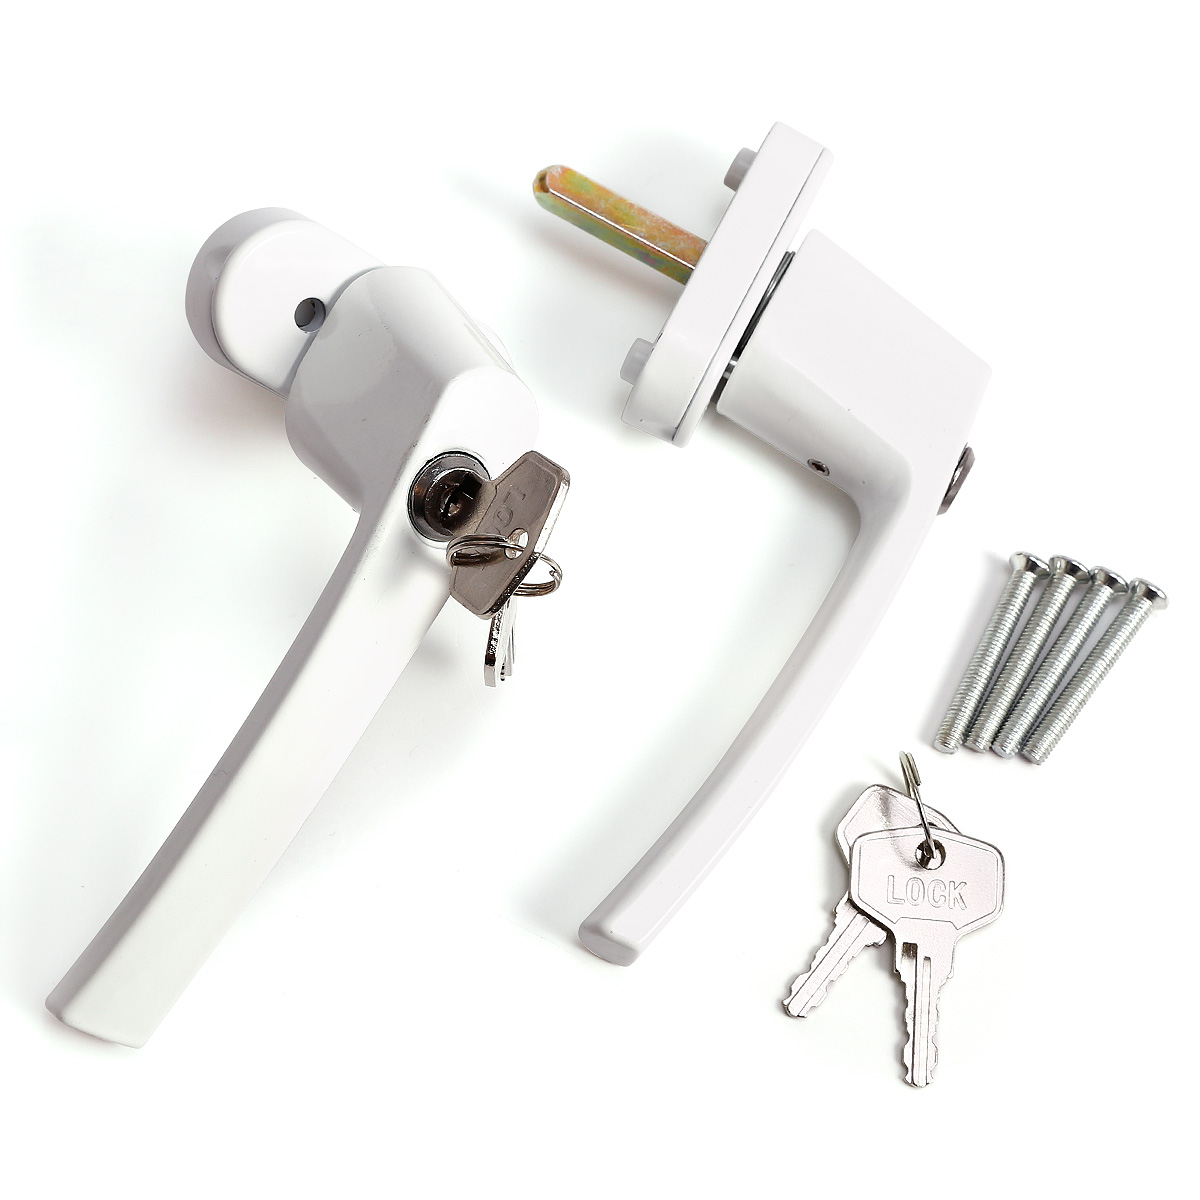 2x poign e de porte blanche avec serrure de cl ebay - Poignee de porte avec serrure integree ...